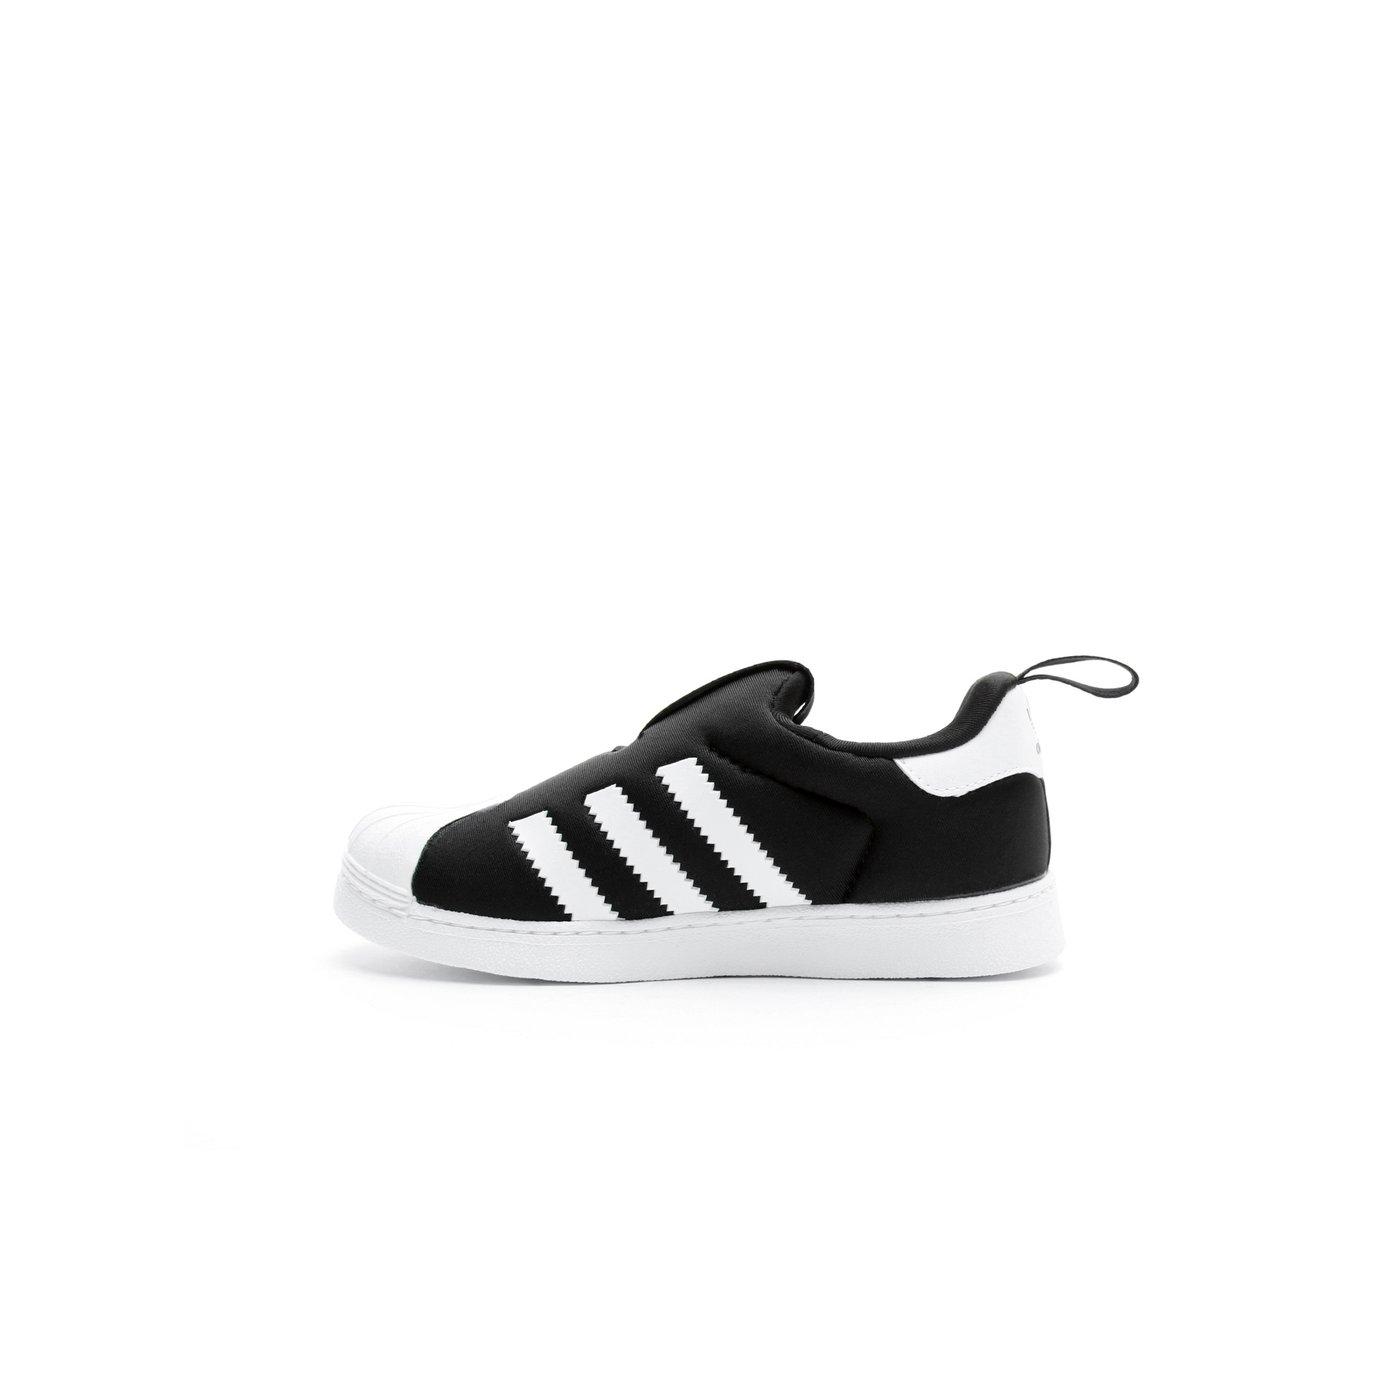 adidas SuperStar 360 Çocuk Siyah Spor Ayakkabı